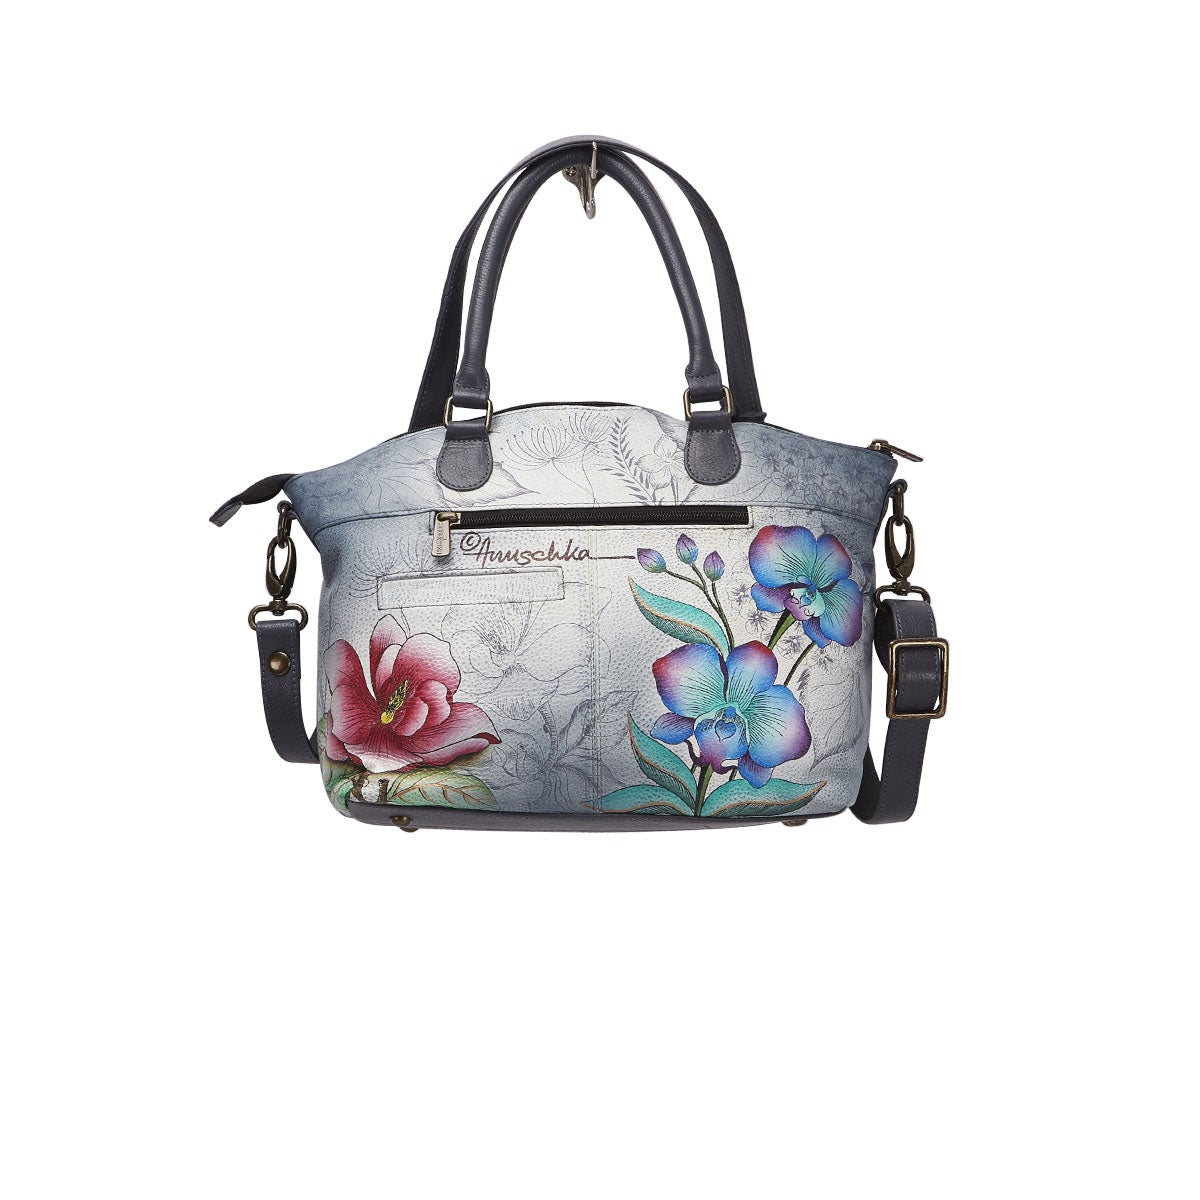 Printed leather Floral Fantasy stachel